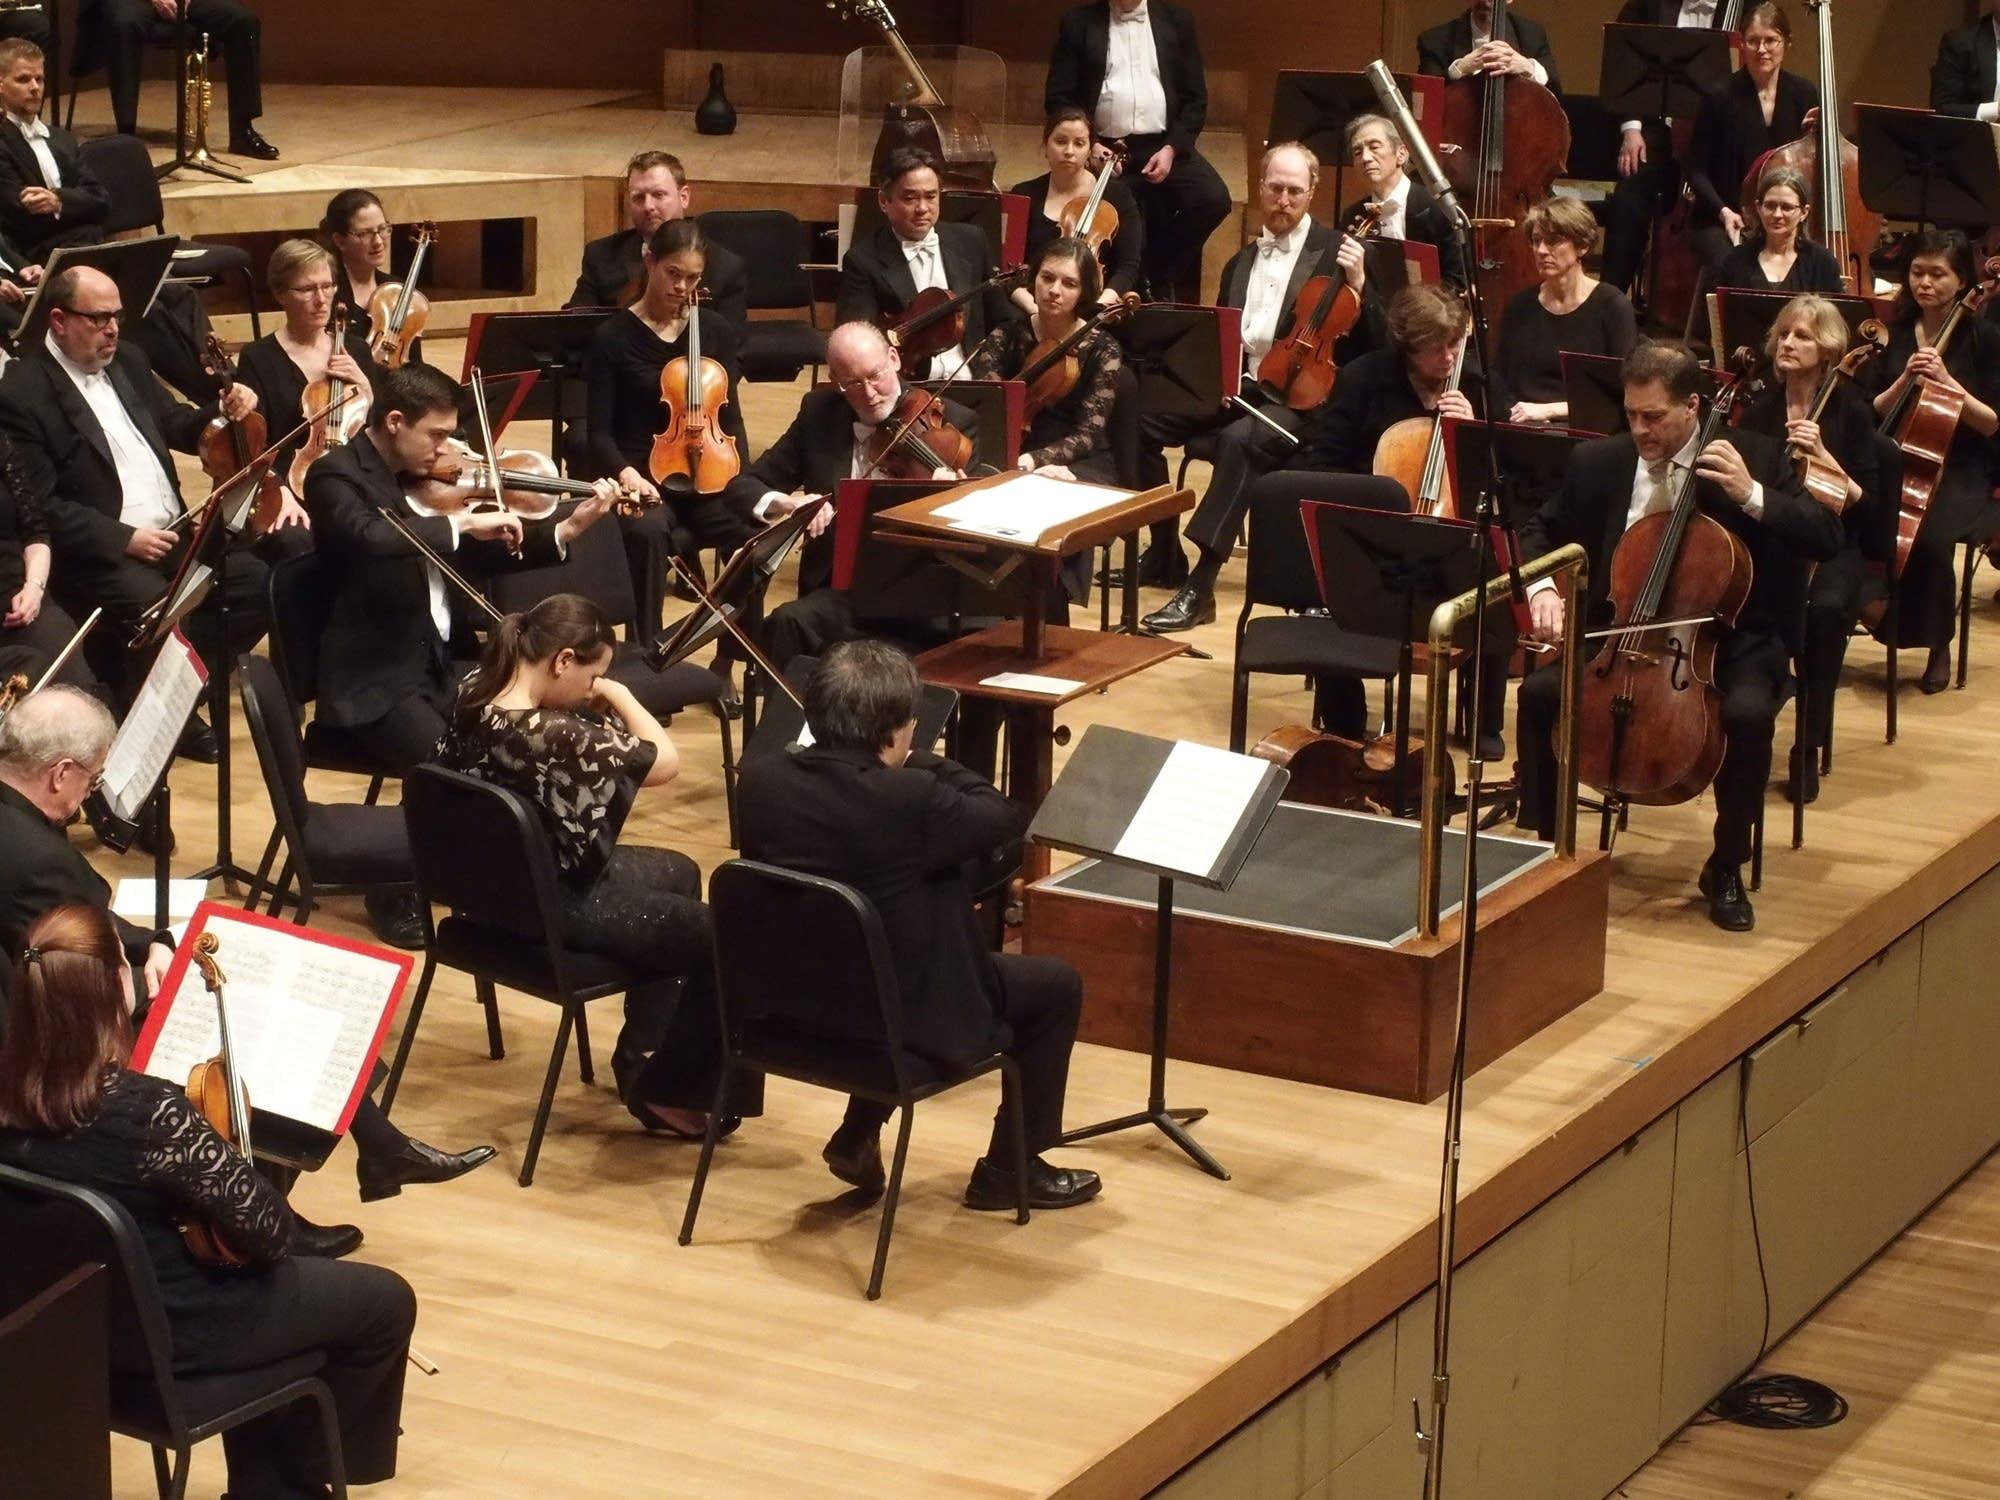 Chamber Music Society of Minnesota played Skrowaczewski's 'For Krystyna'